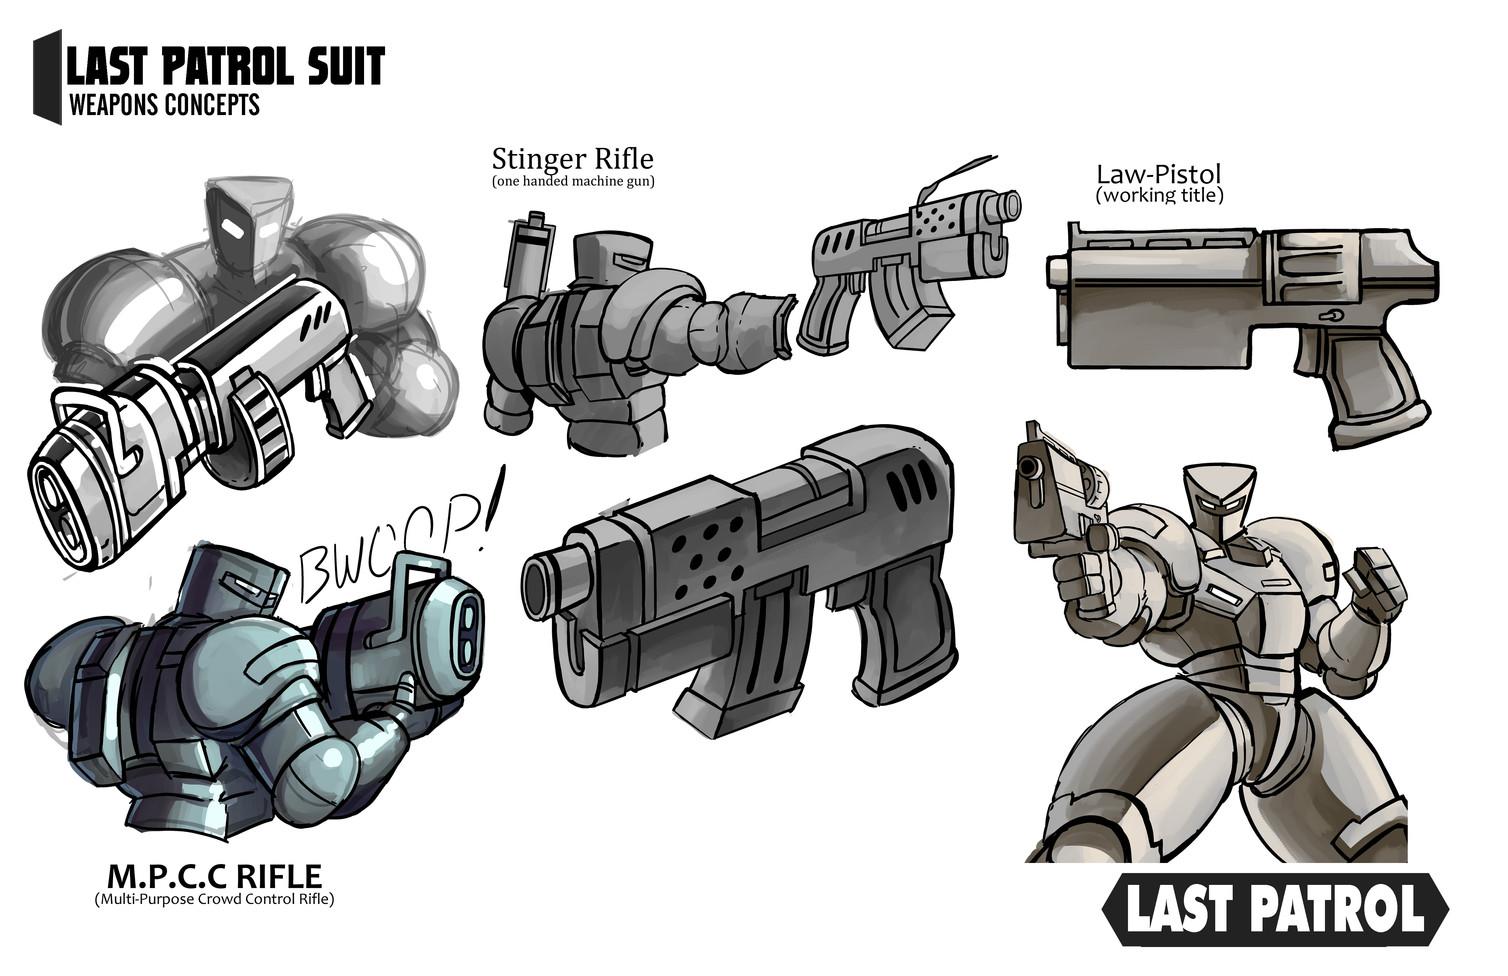 Concept_art_last_patrol_0008_04_WEAPONS.